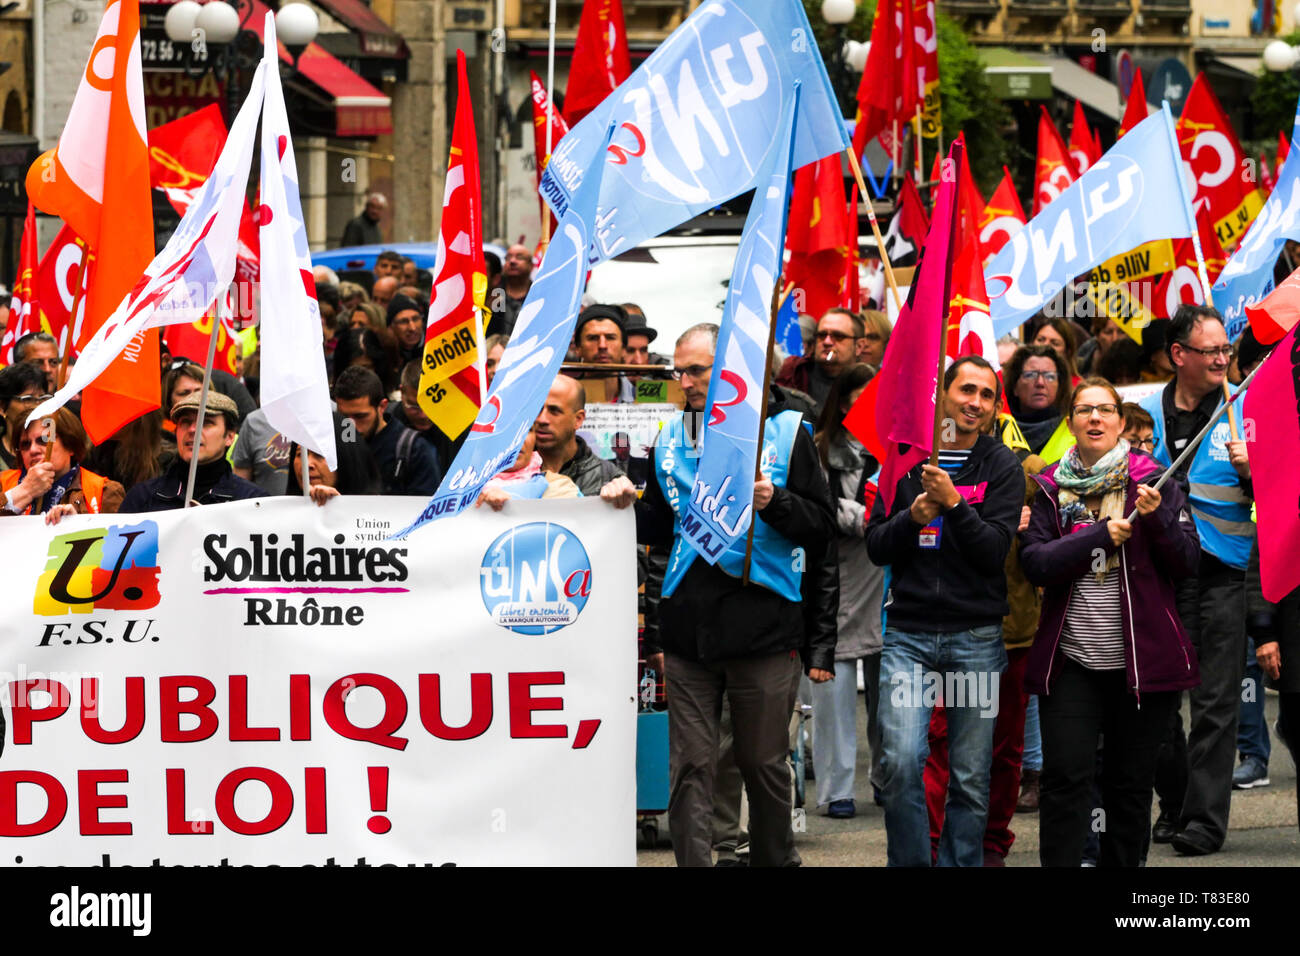 Public officials march to defend civil Services, Lyon, France - Stock Image